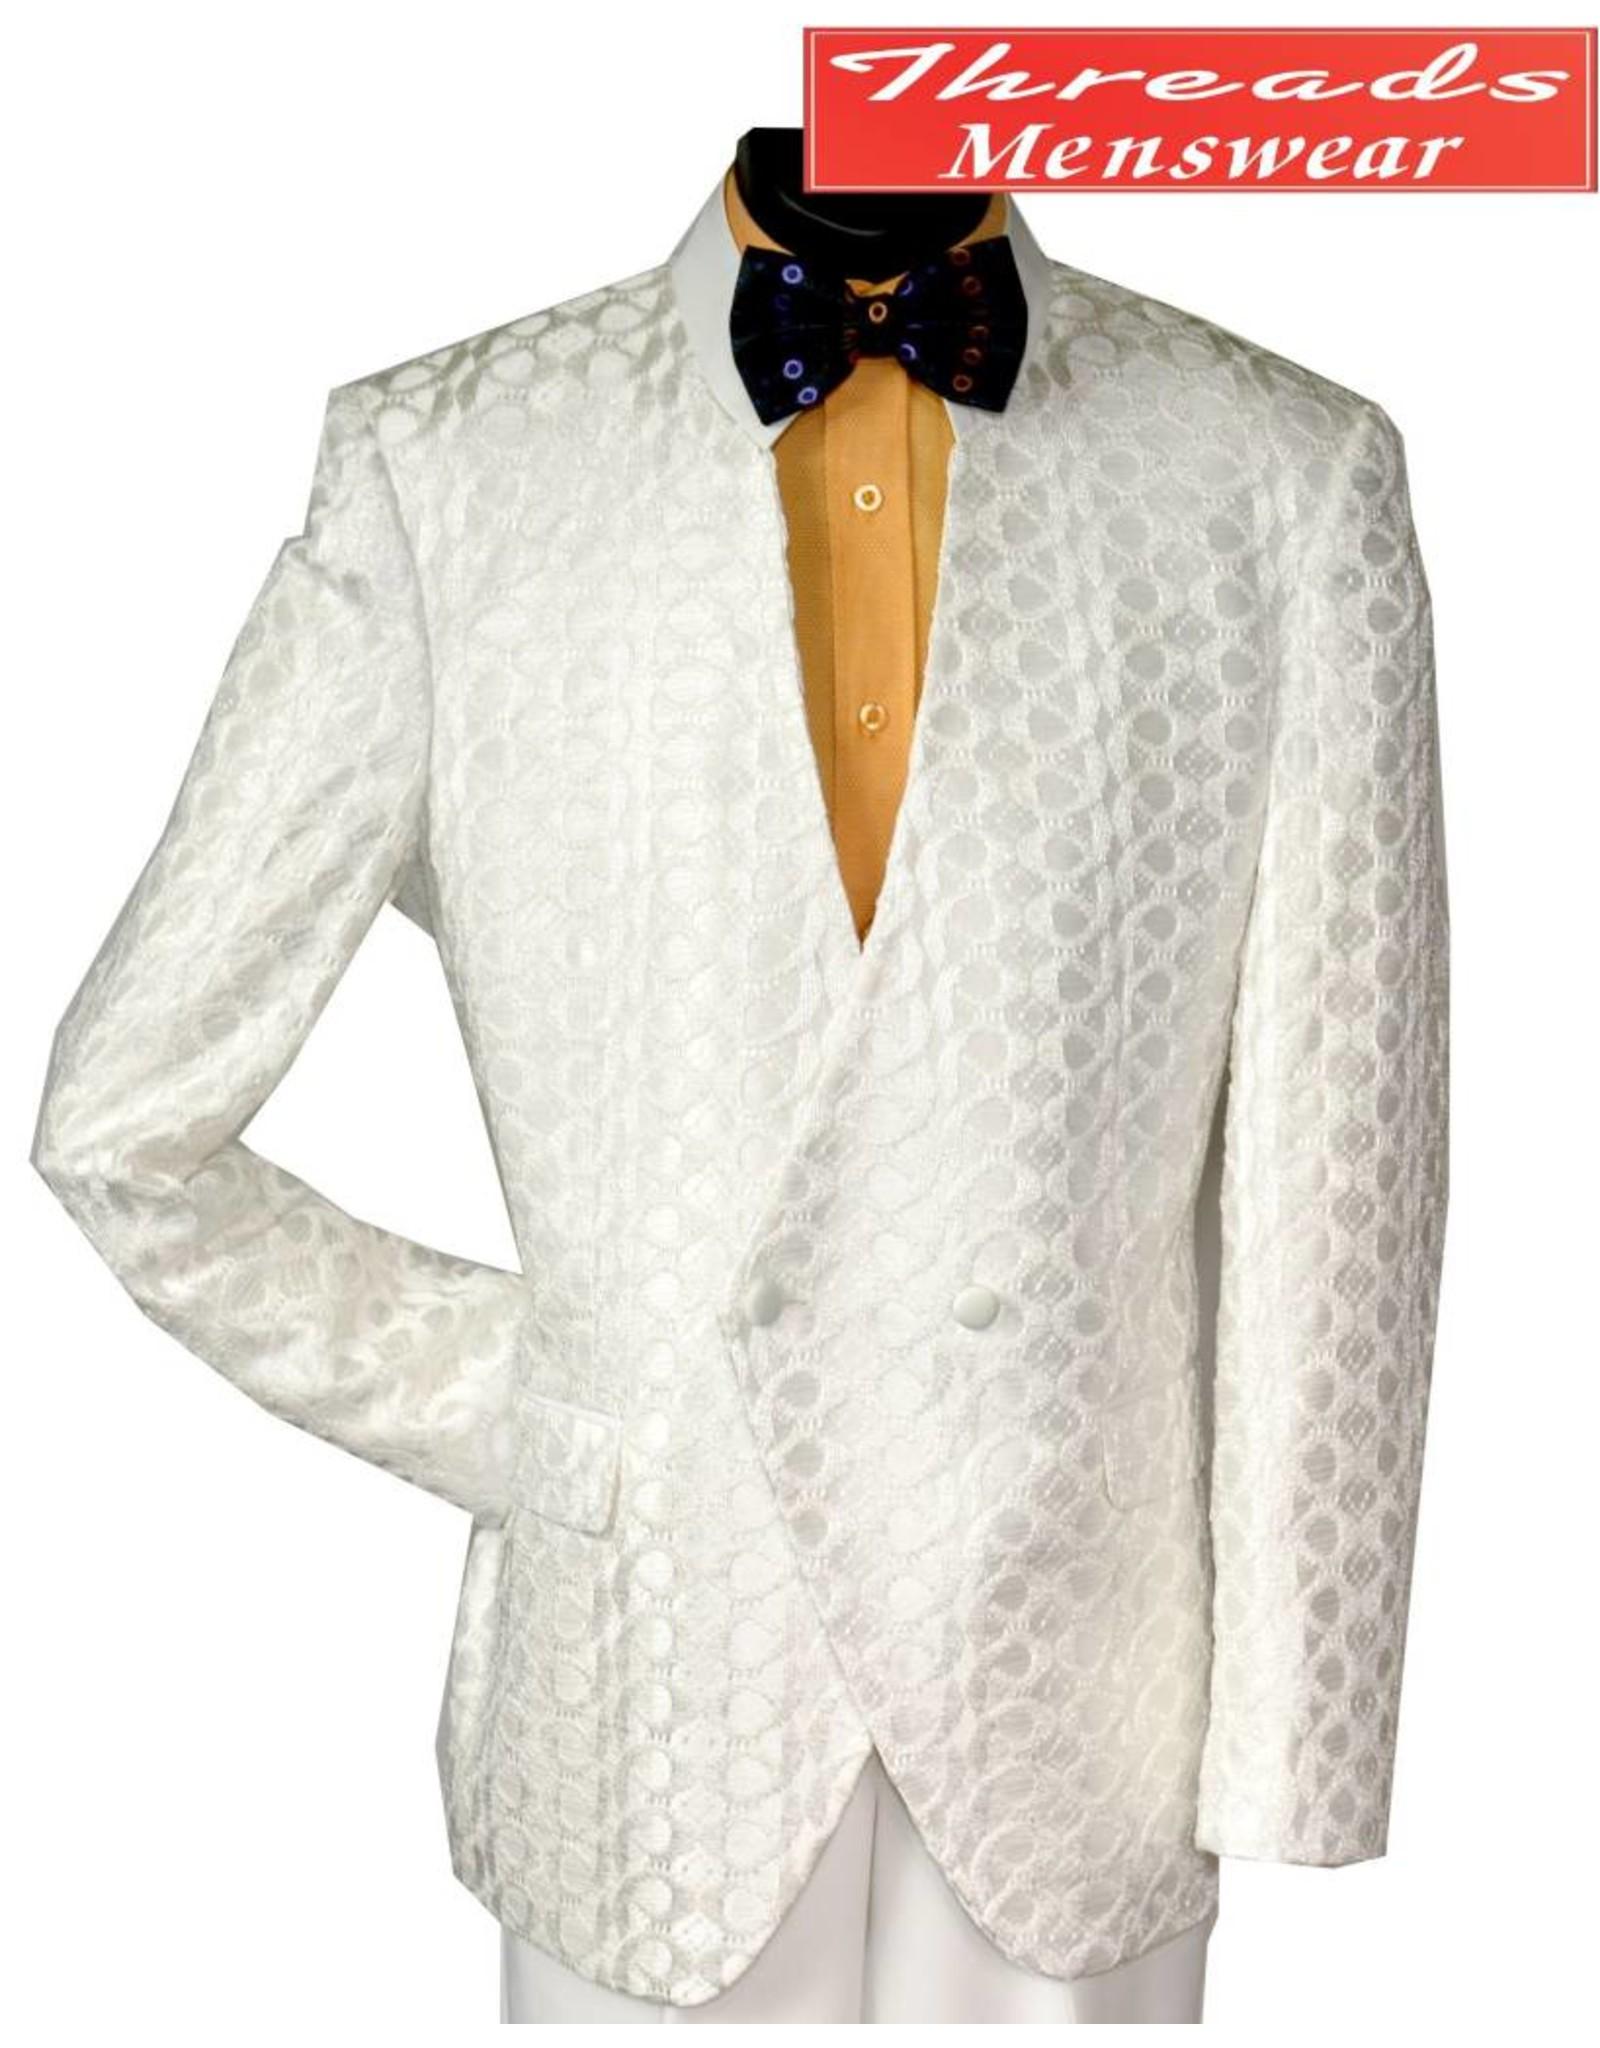 Blu Martini Blu Martini Mandarin Collar Suit - Dandi